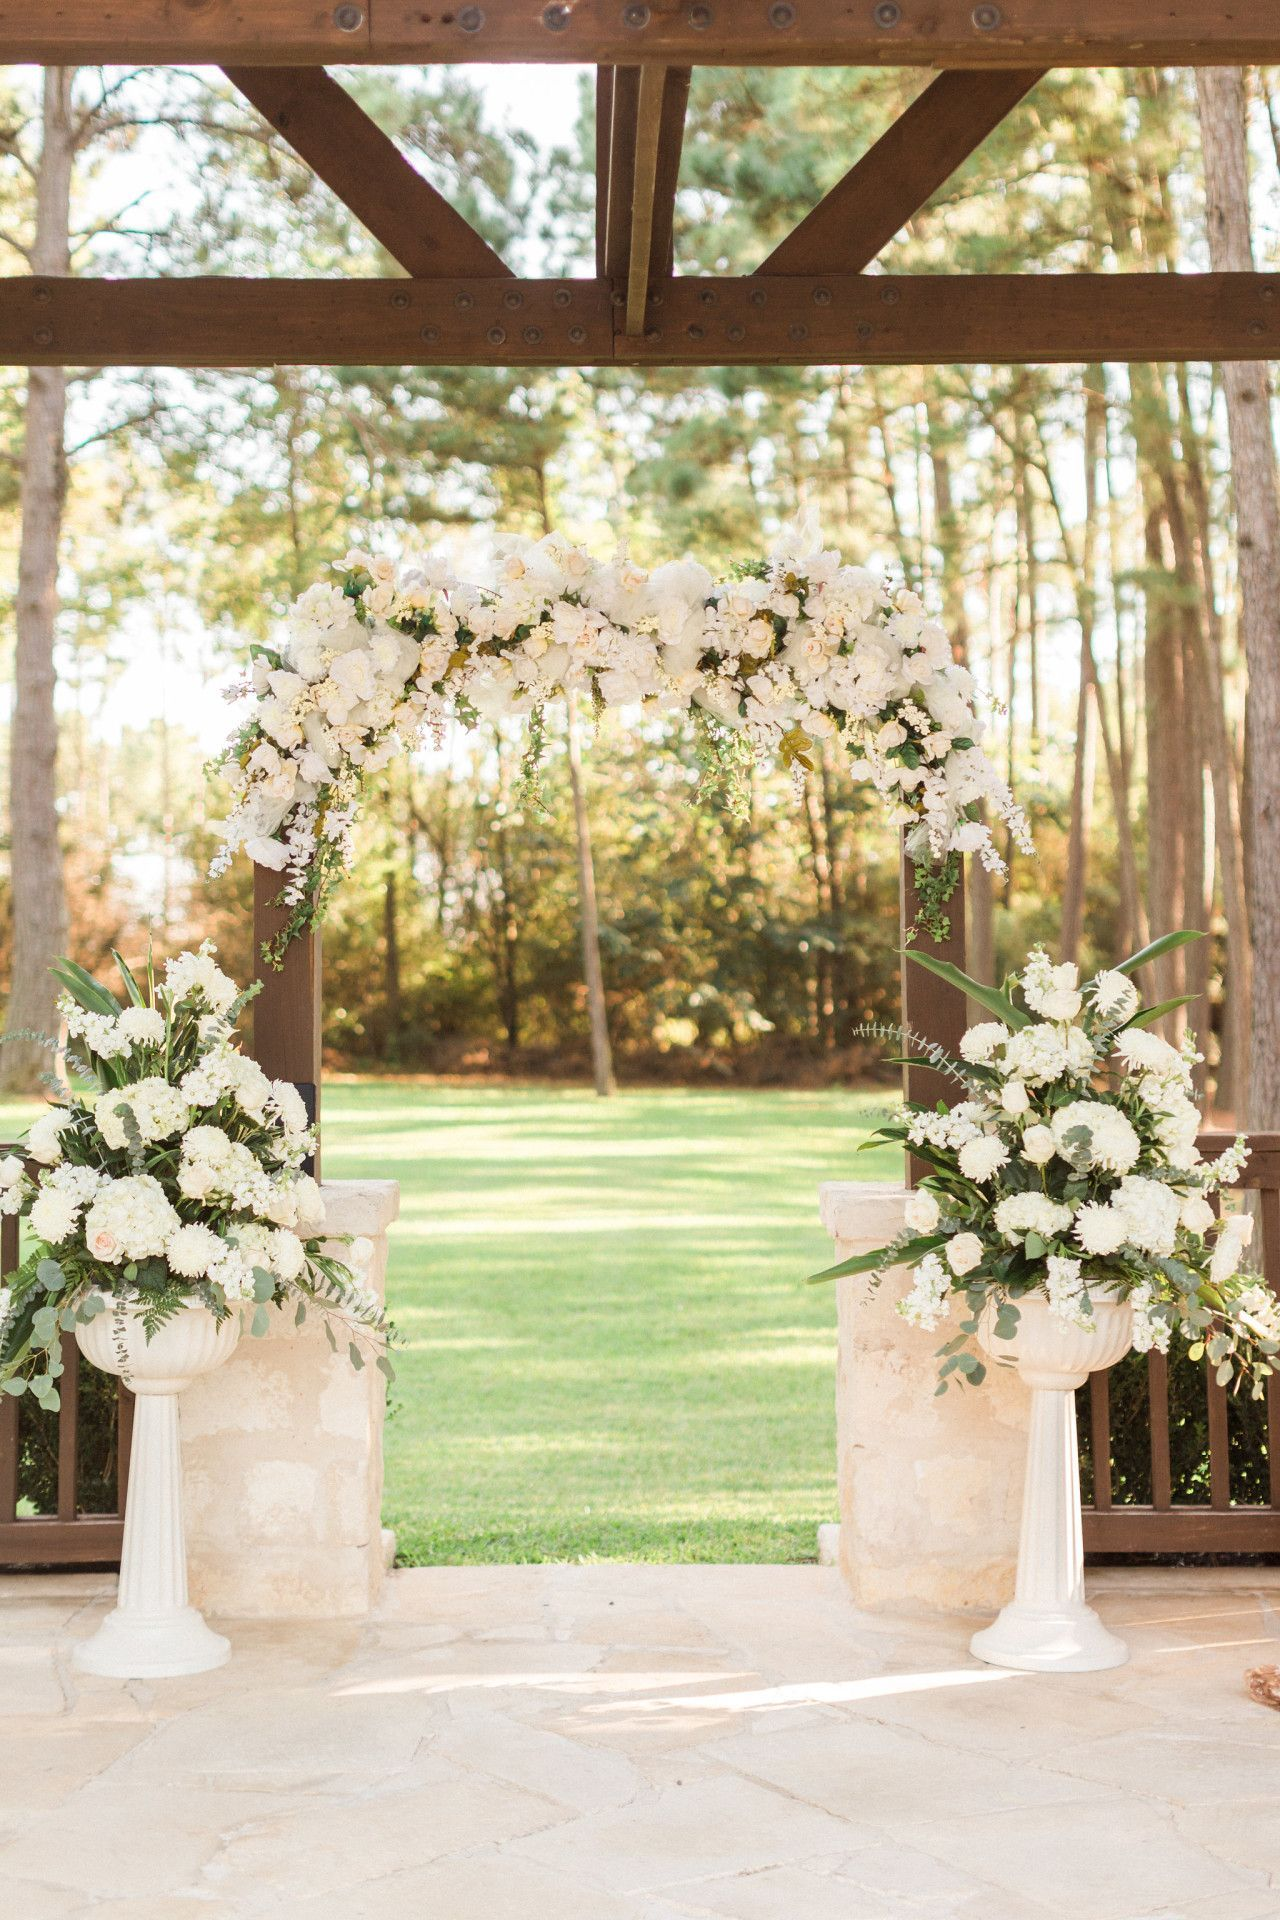 blush pink  white wedding arch decor  elegant wedding arch